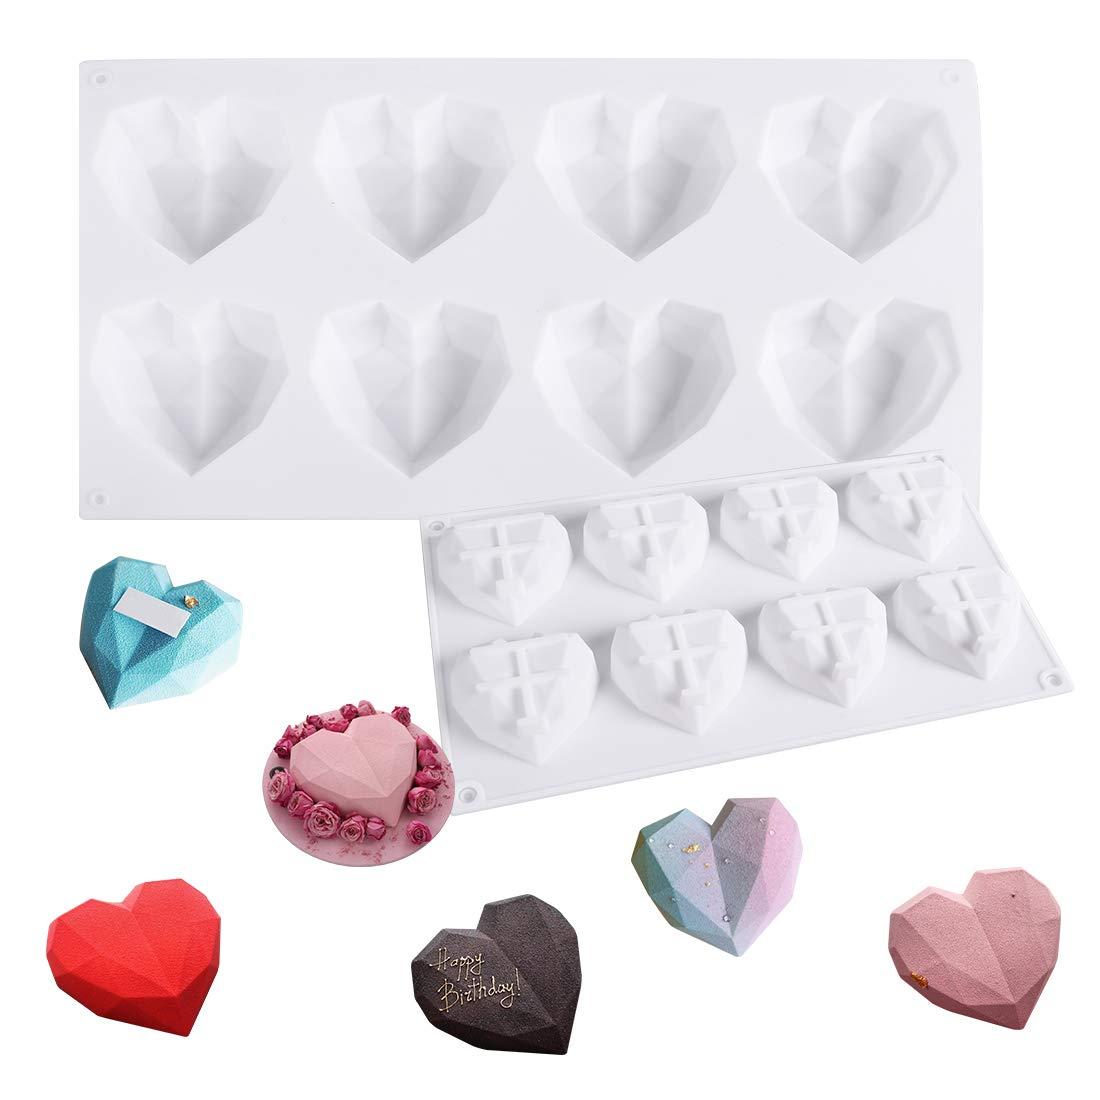 Silicone Heart Diamond Shaped Cake Mold Tray for Baking Chocolate Fondant Wedding Engagement Valentines Day (8 cavities Diamond Heart)